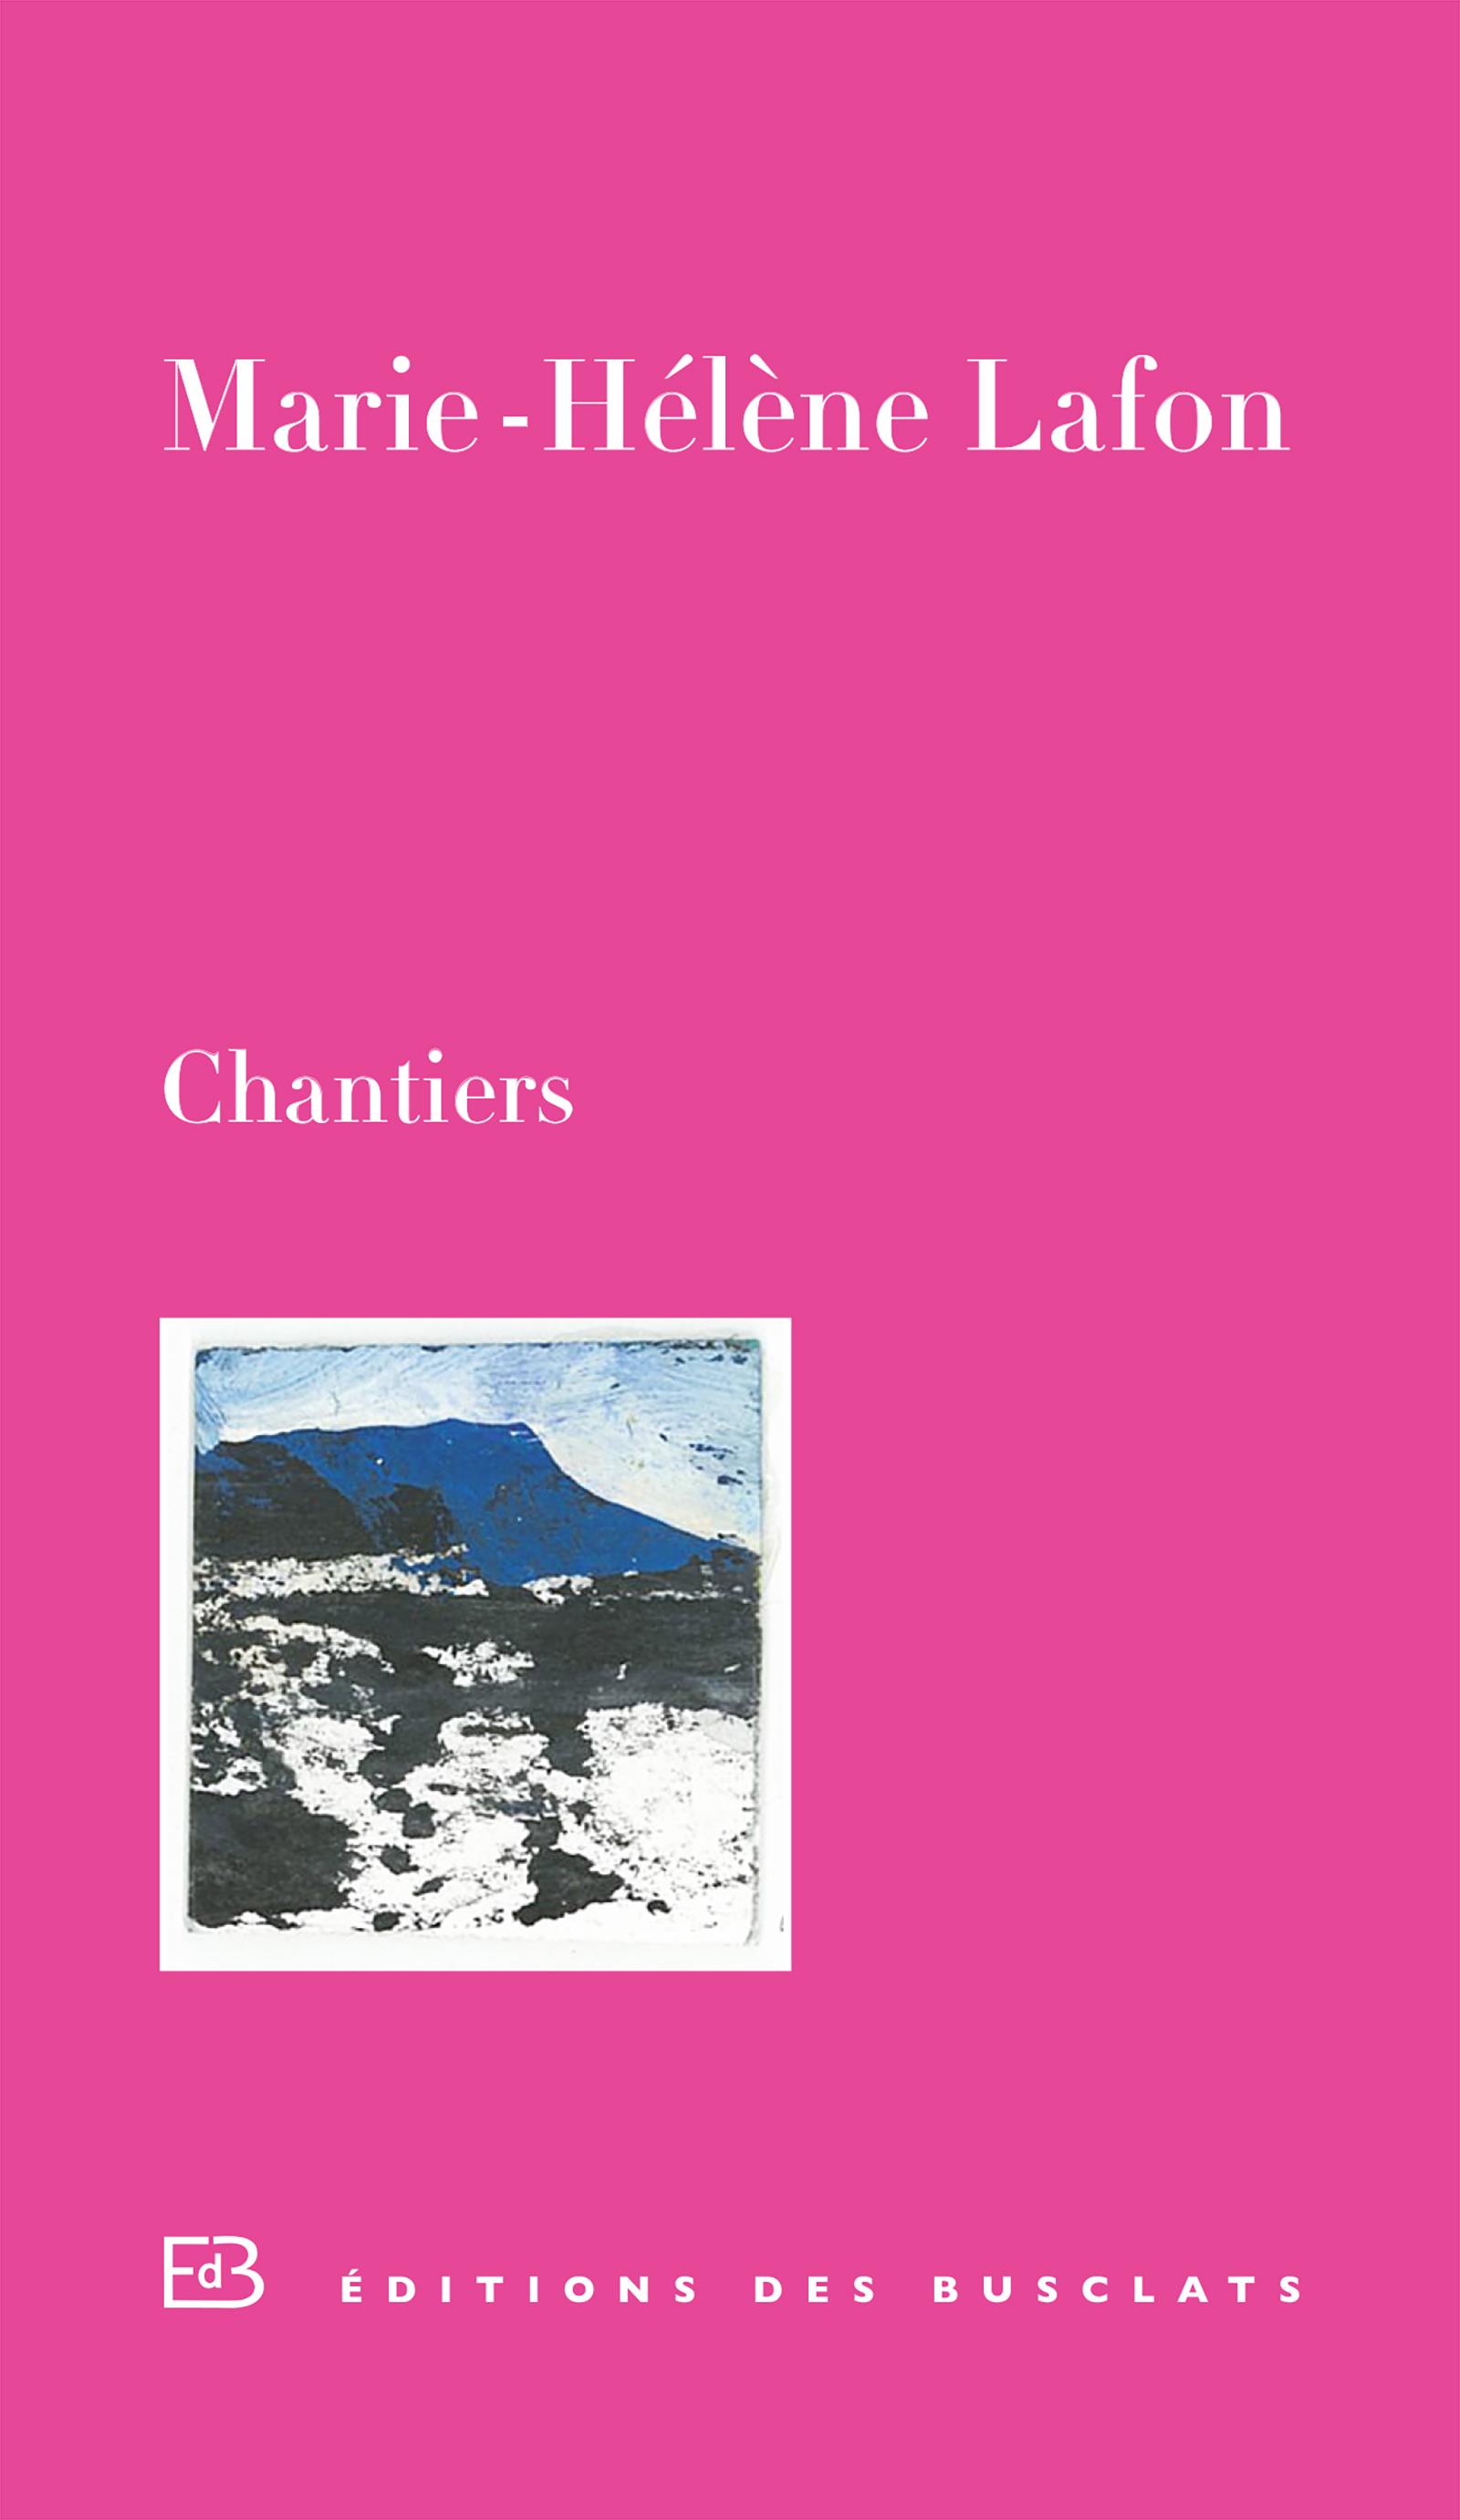 Chantiers